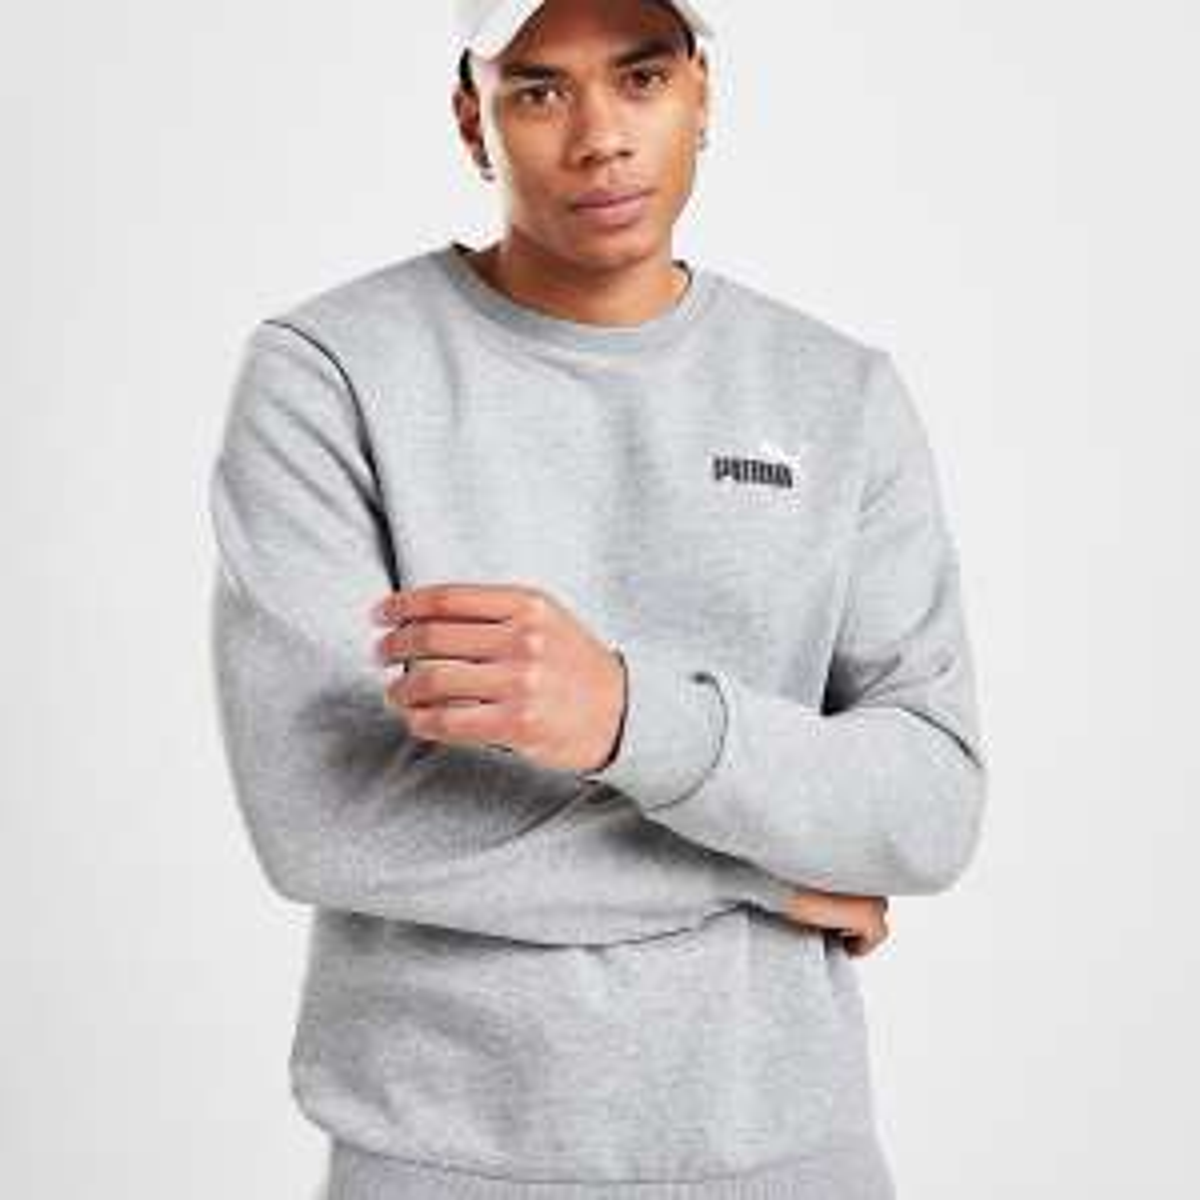 10% Rabatt auf Sale bei JD Sports: z.B. Puma Core Sweatshirt grau (Gr. XS - XL) oder Adidas Celtic Glasgow Heimtrikot 20/21 (Gr. XS - XXL)